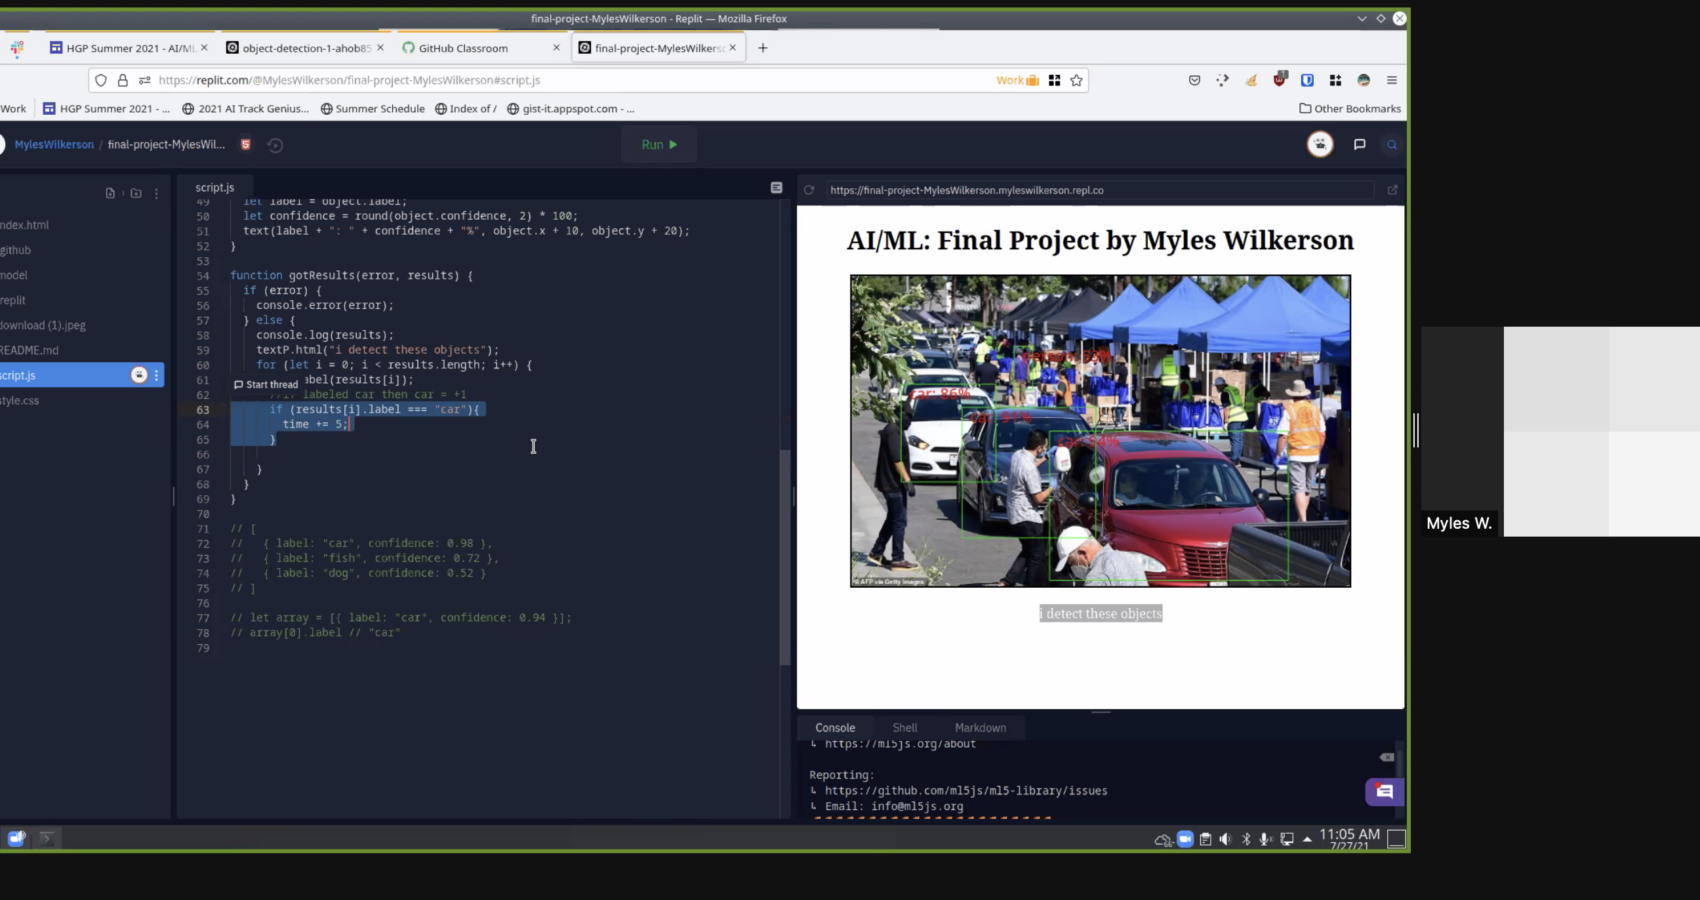 AI-Track-2021ImmersionProgram-TheHiddenGeniusProject